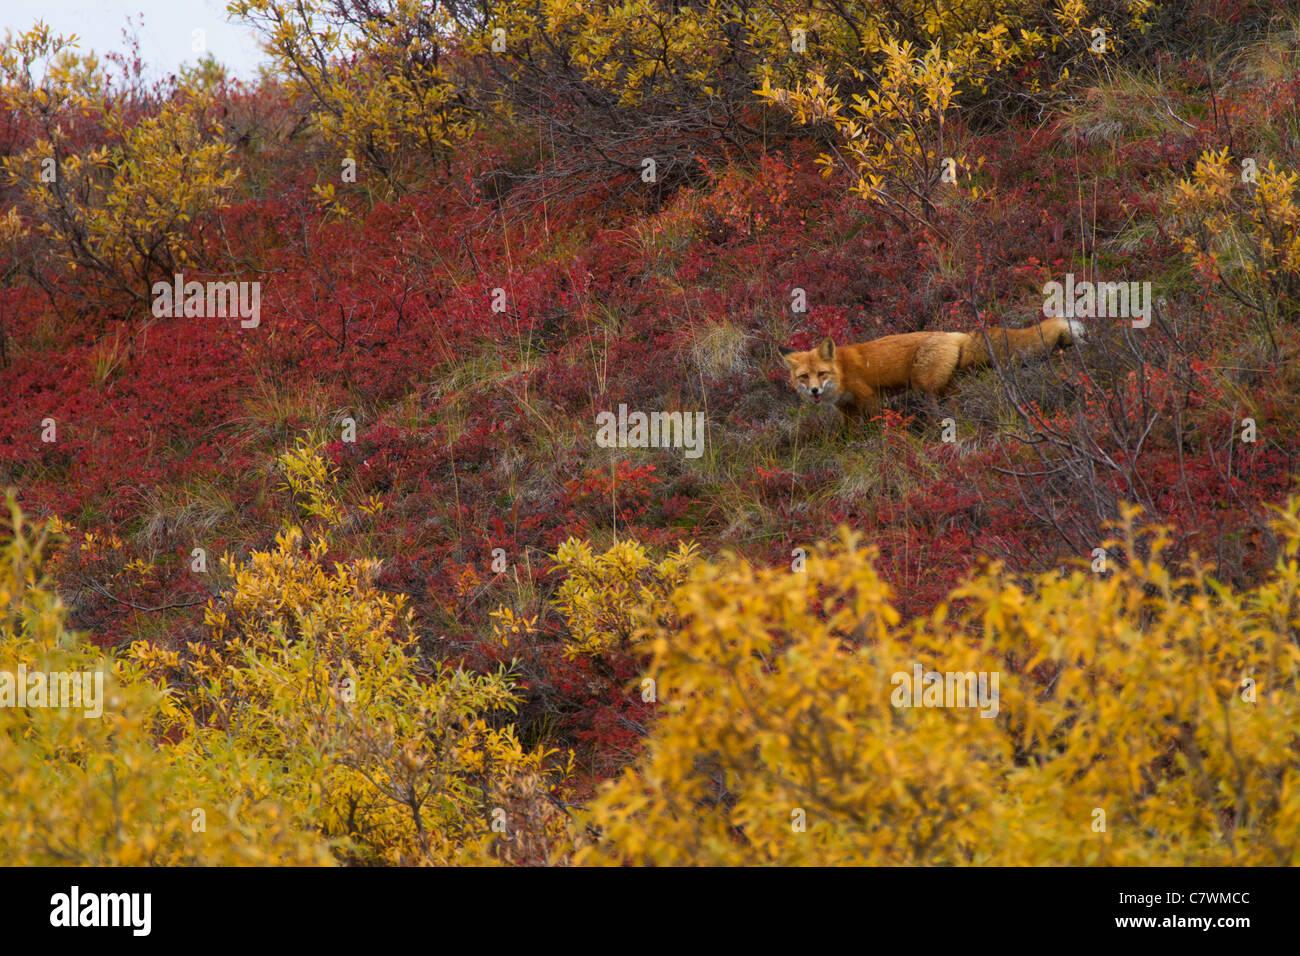 Red fox, Denali National Park, Alaska. - Stock Image